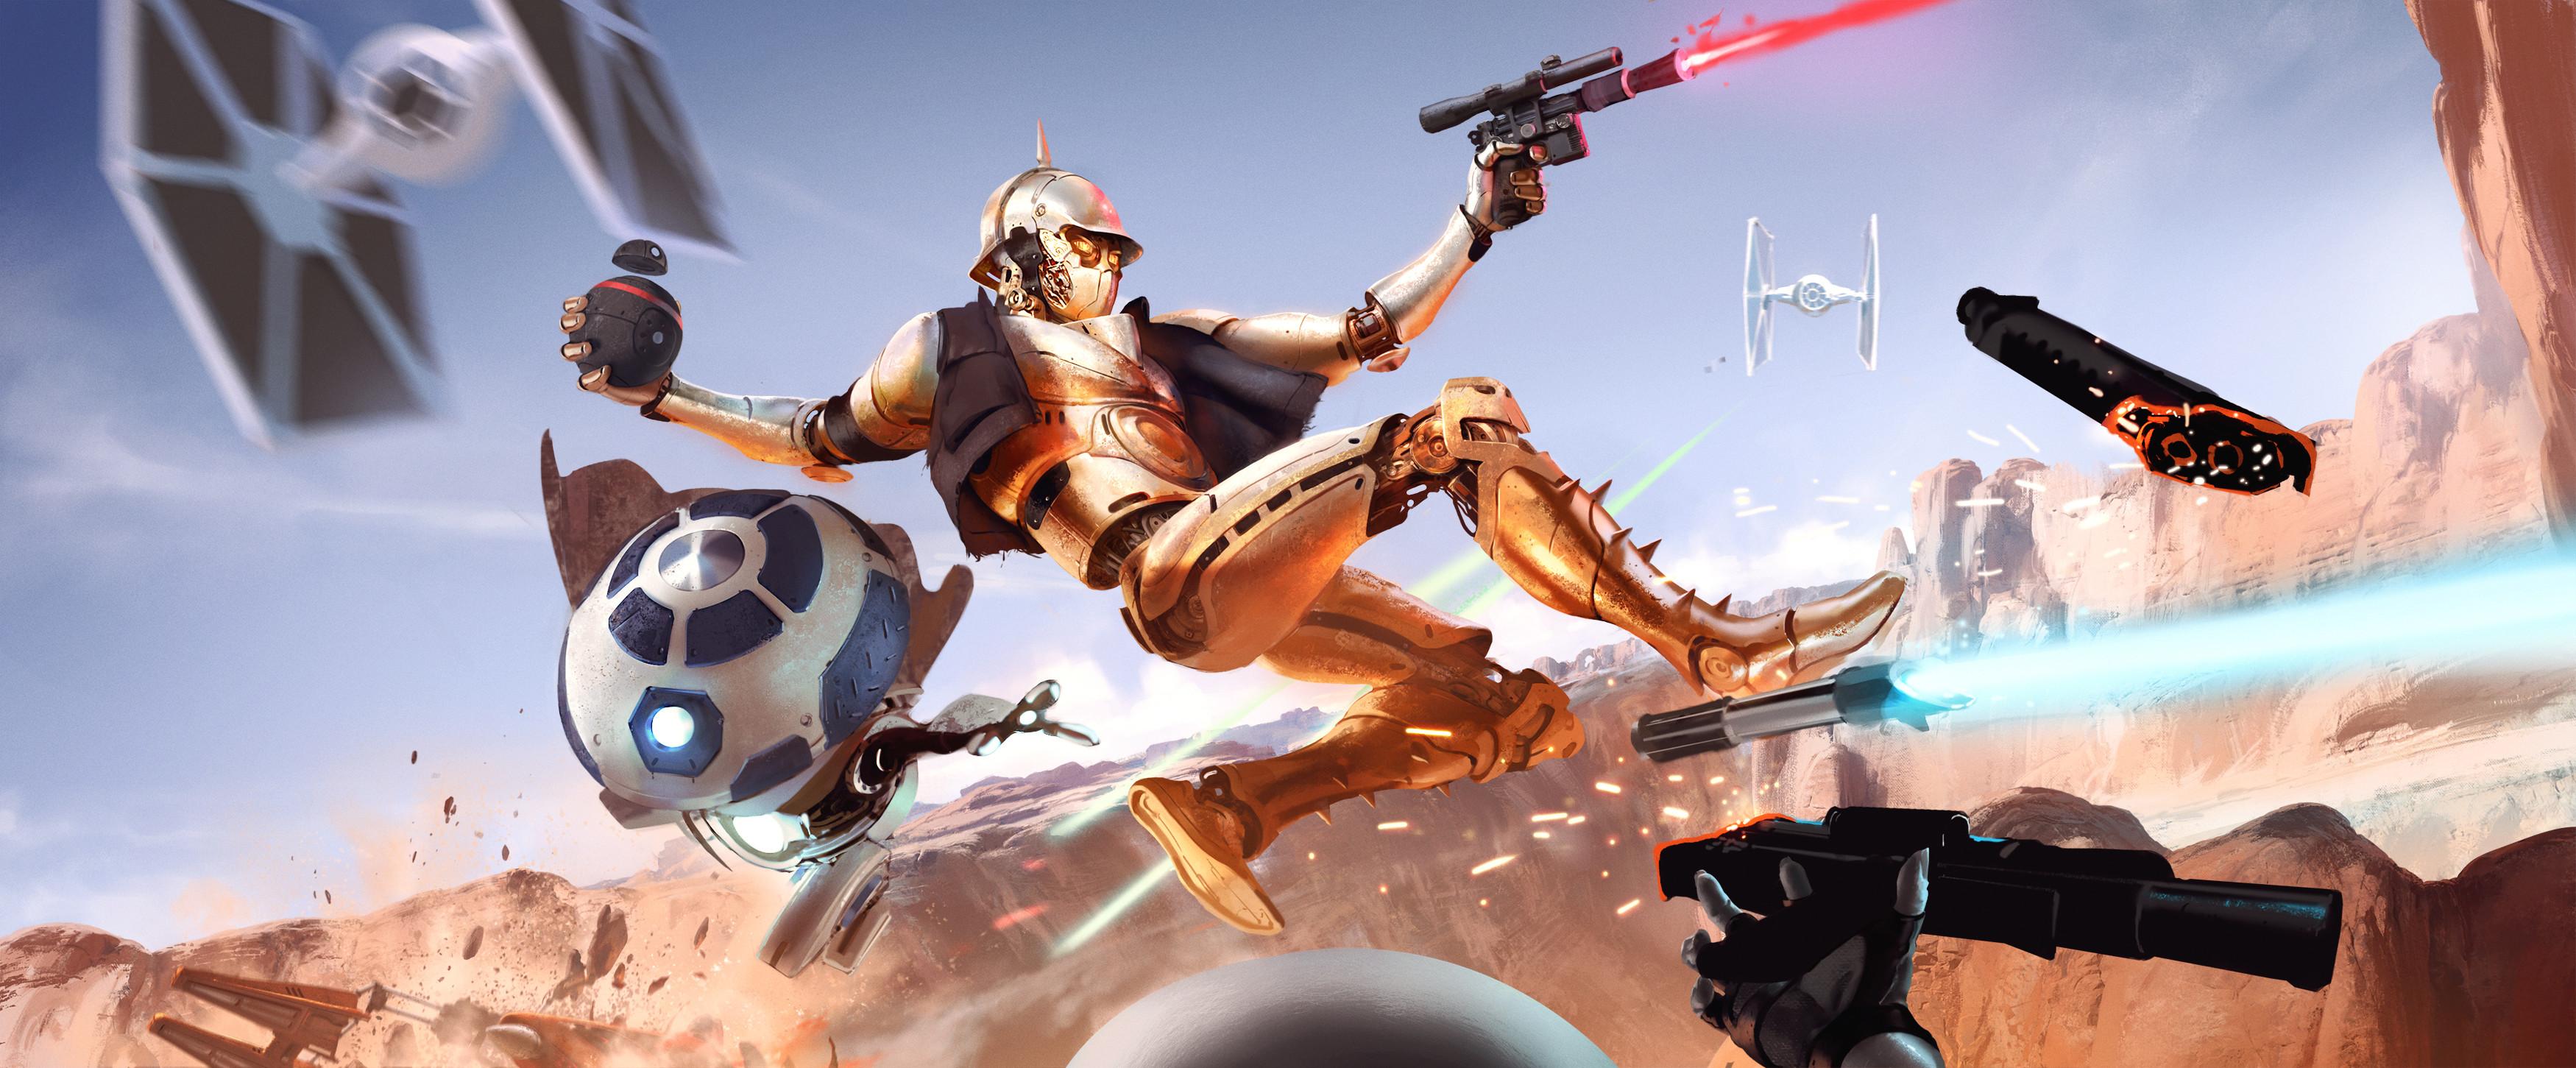 Sci Fi – Star Wars C-3PO R2-D2 TIE Fighter Wallpaper